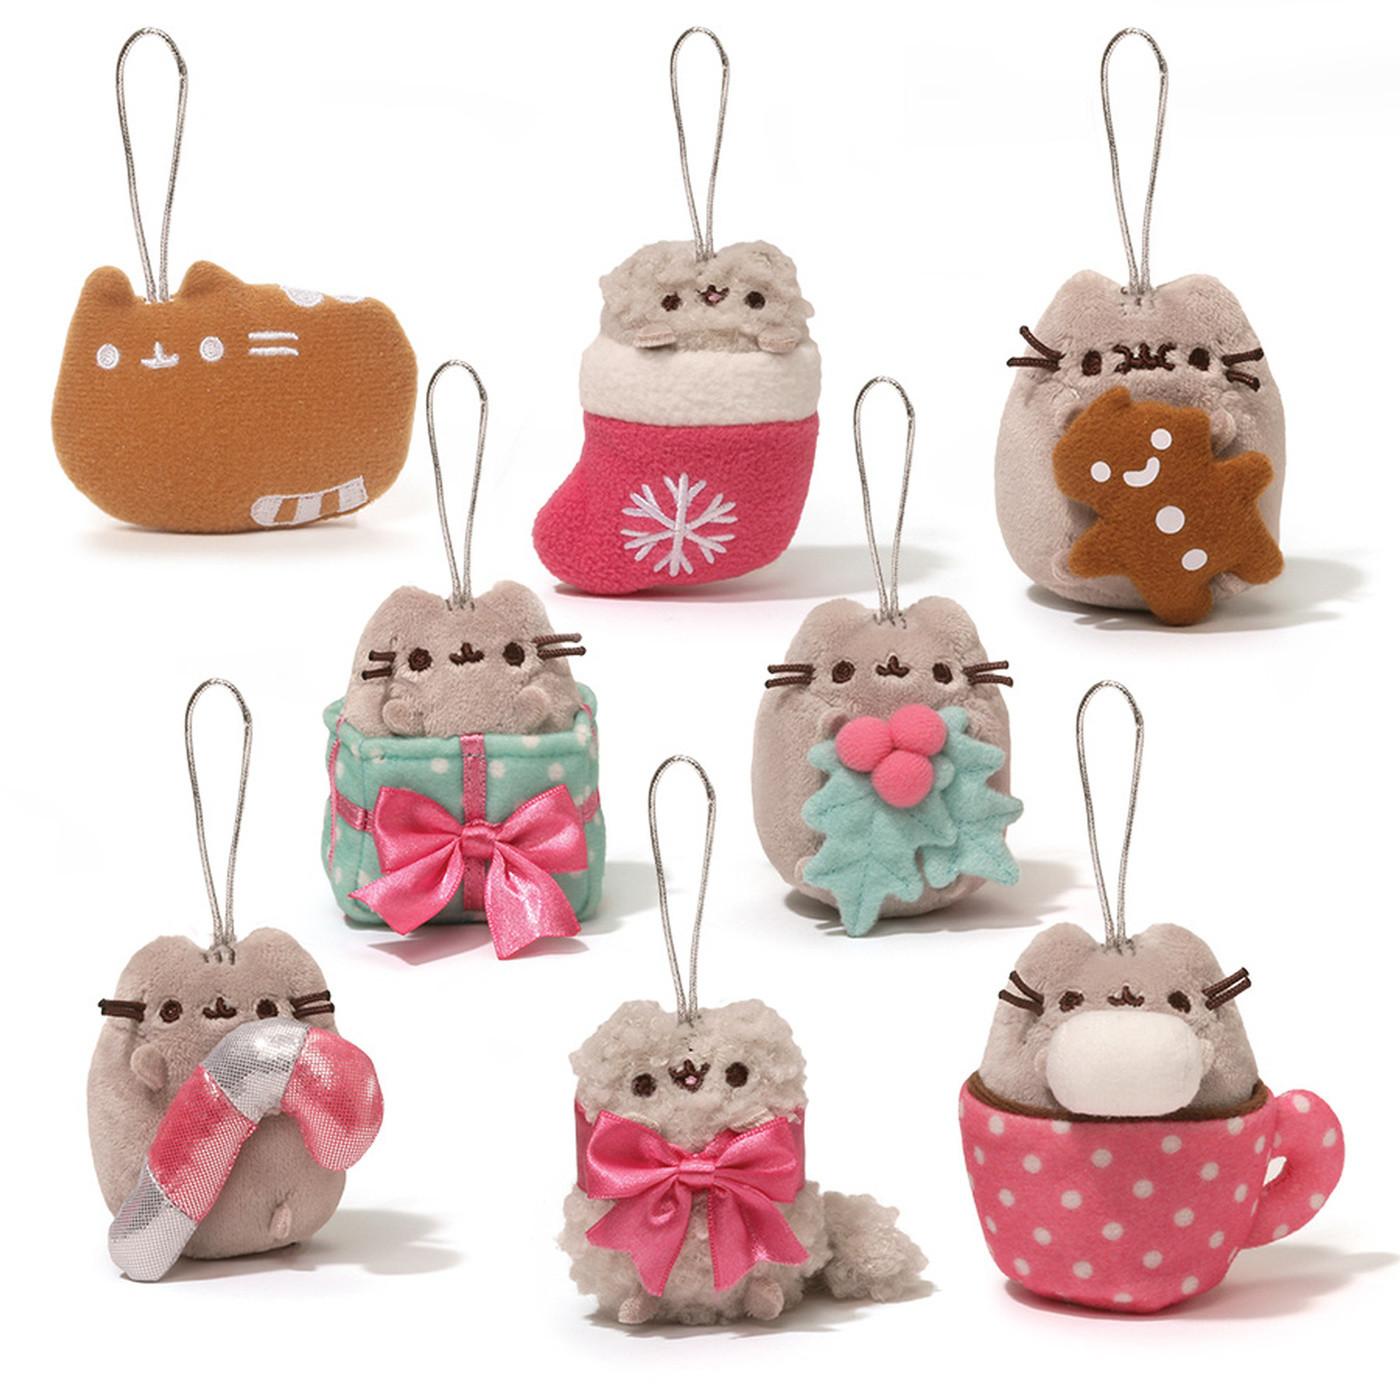 Pusheen Surprise Plush Blind Box Series 2 Ornaments